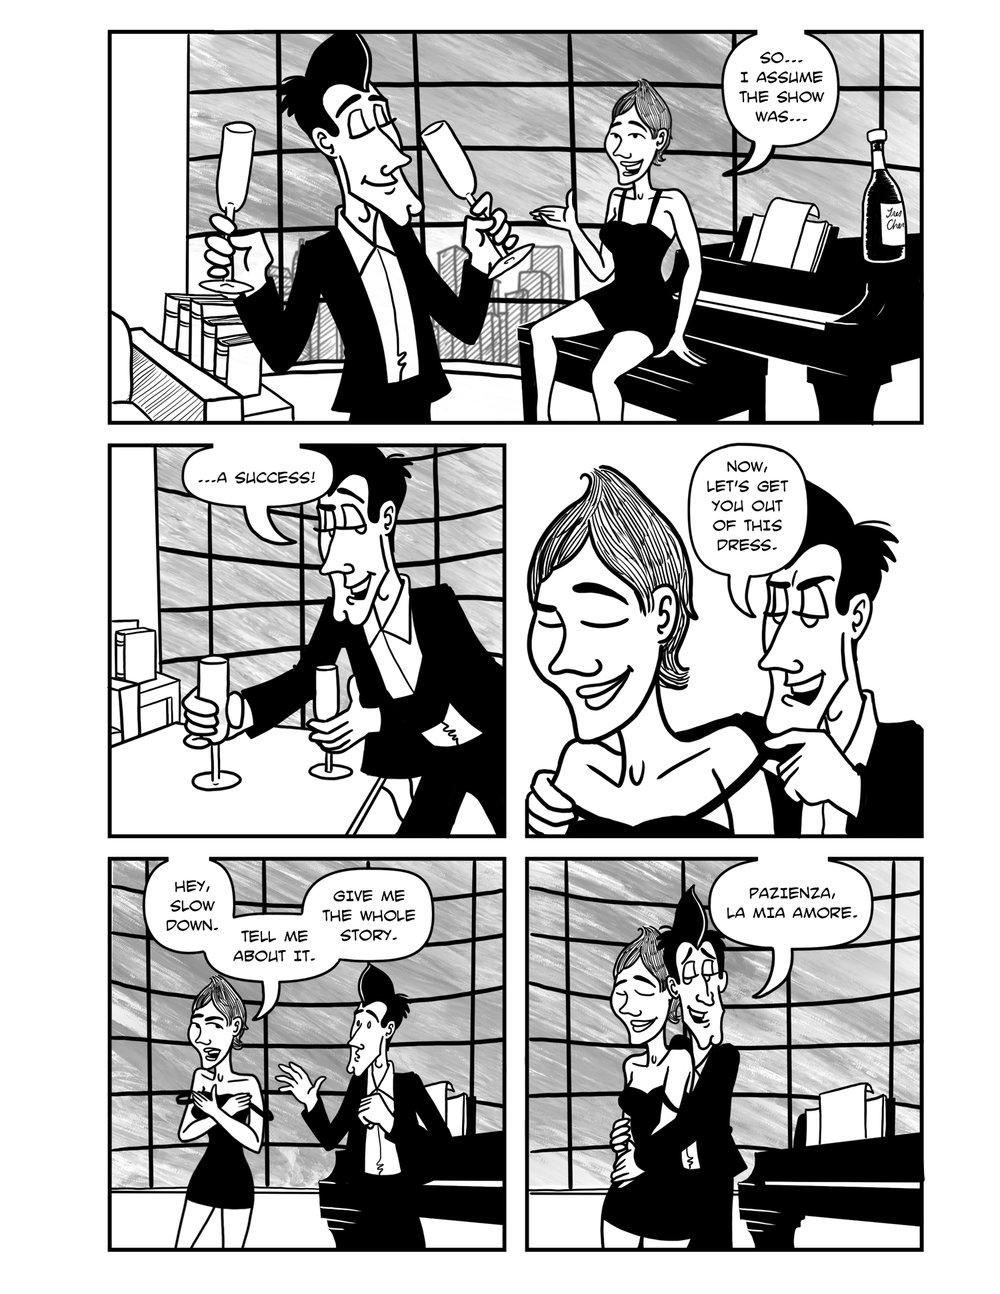 PAGE-292.jpg